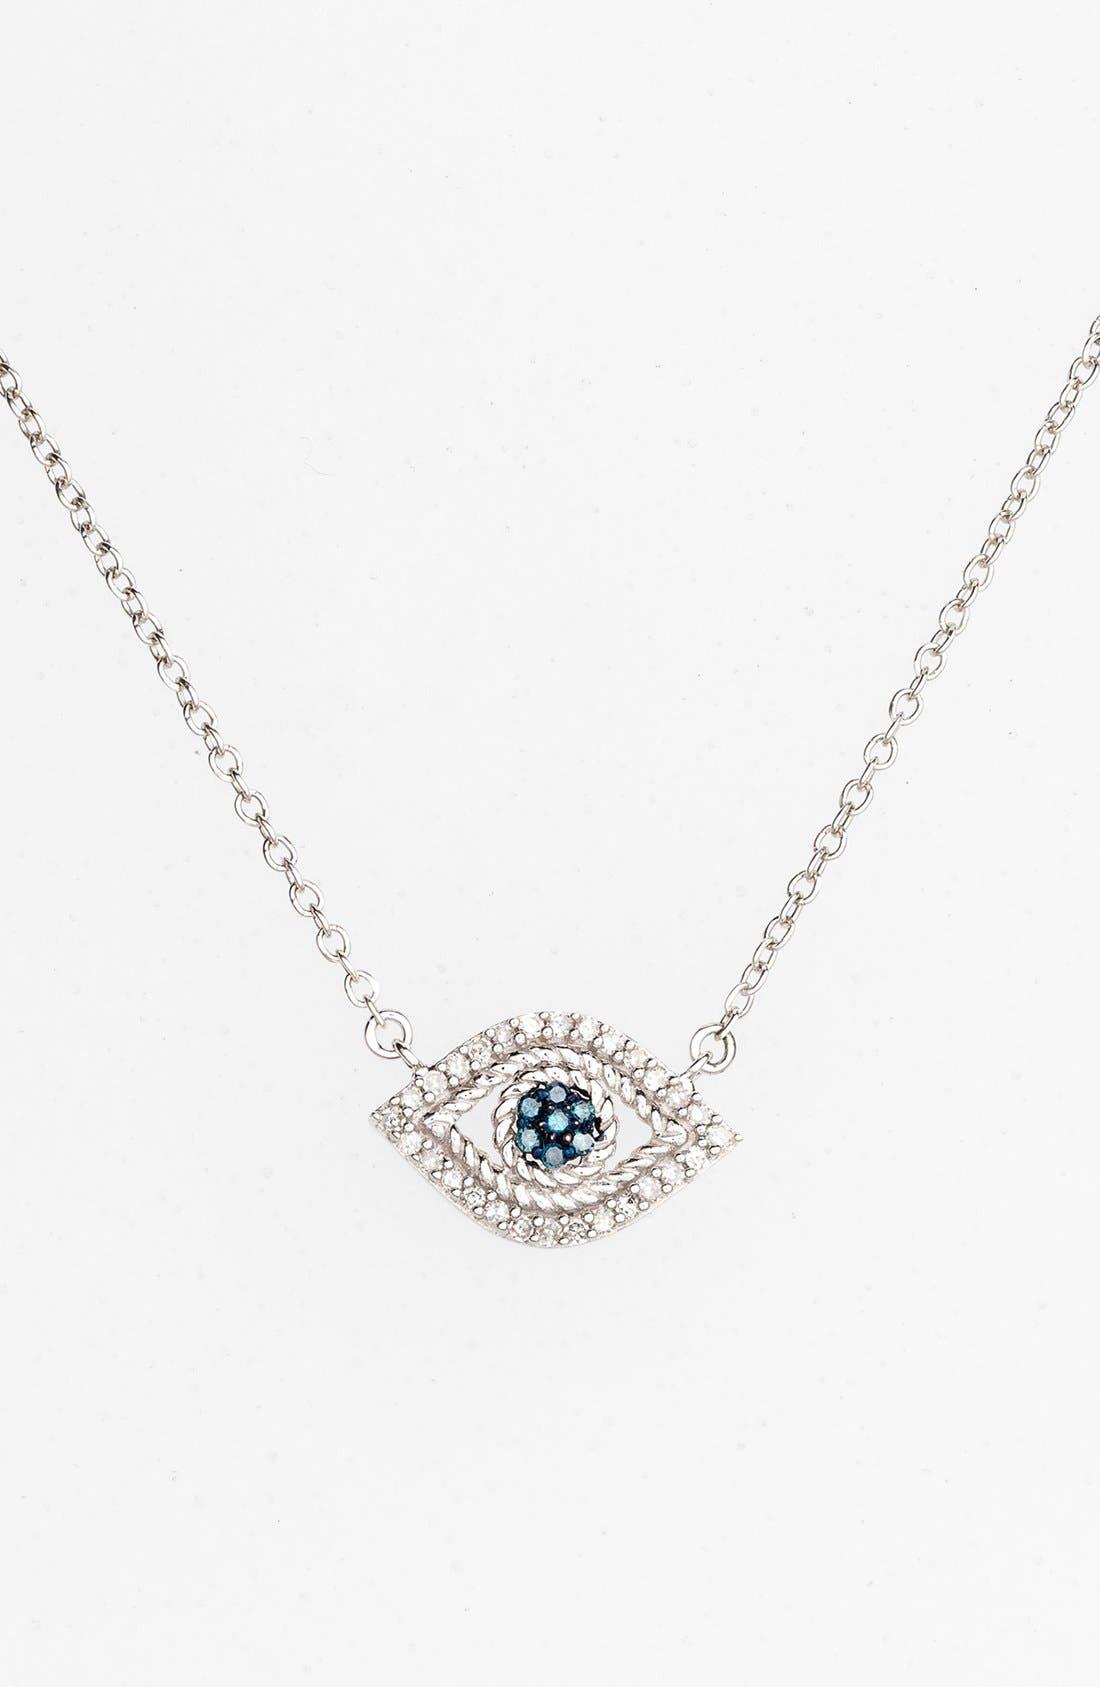 Main Image - Adina Reyter 'Evil Eye' Diamond & Sapphire Pendant Necklace